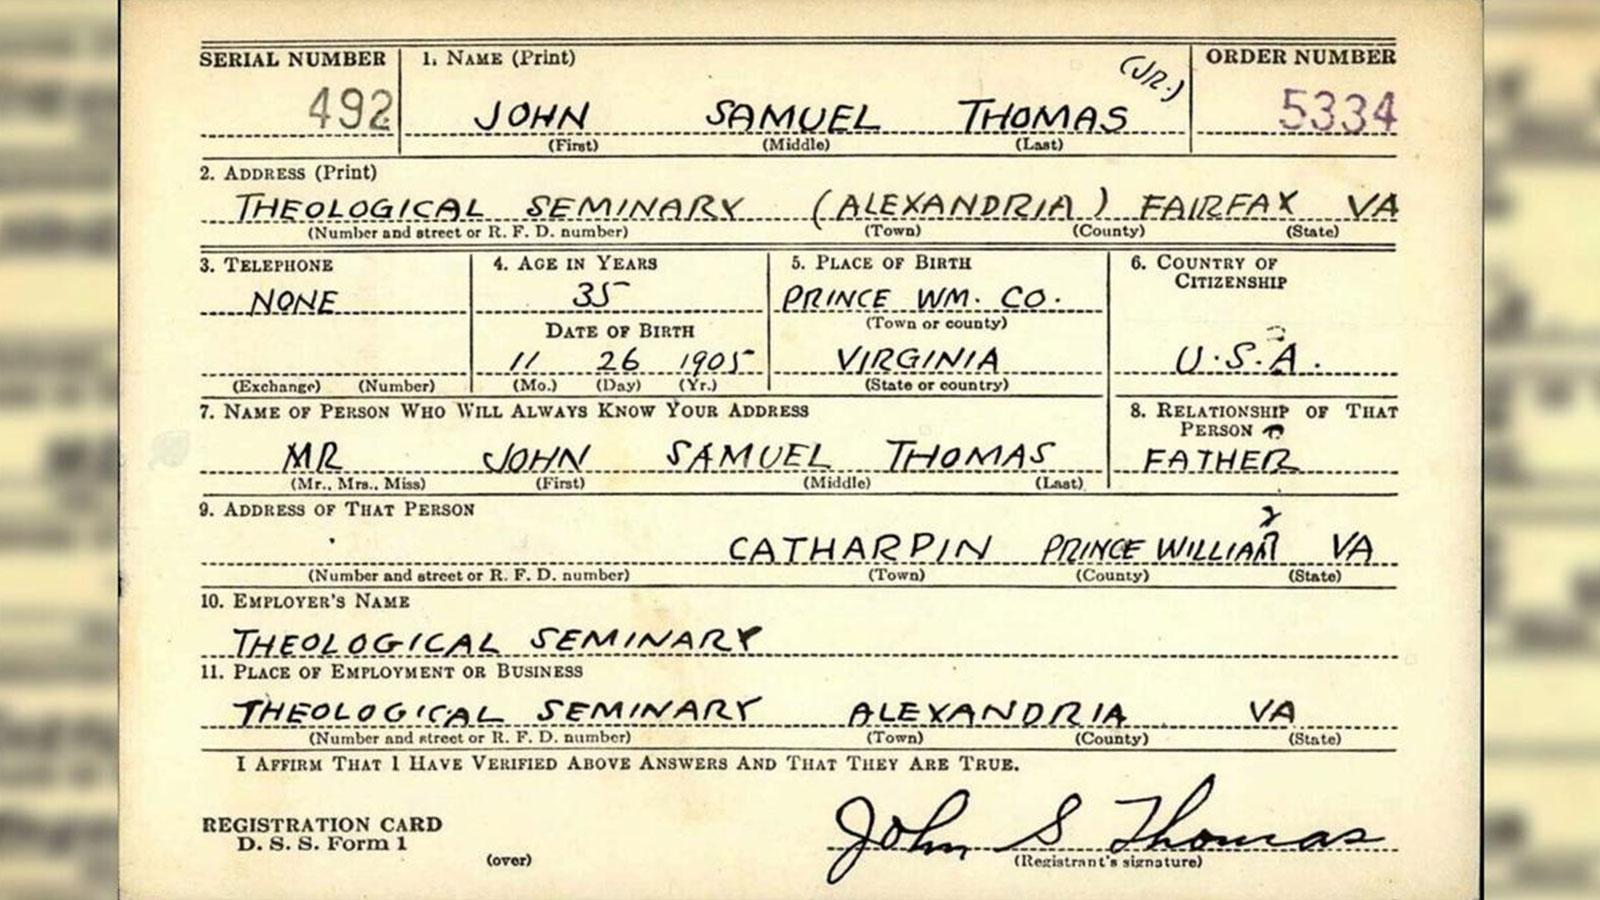 Virginia Theological Seminary: John Samuel Thomas Jr. document